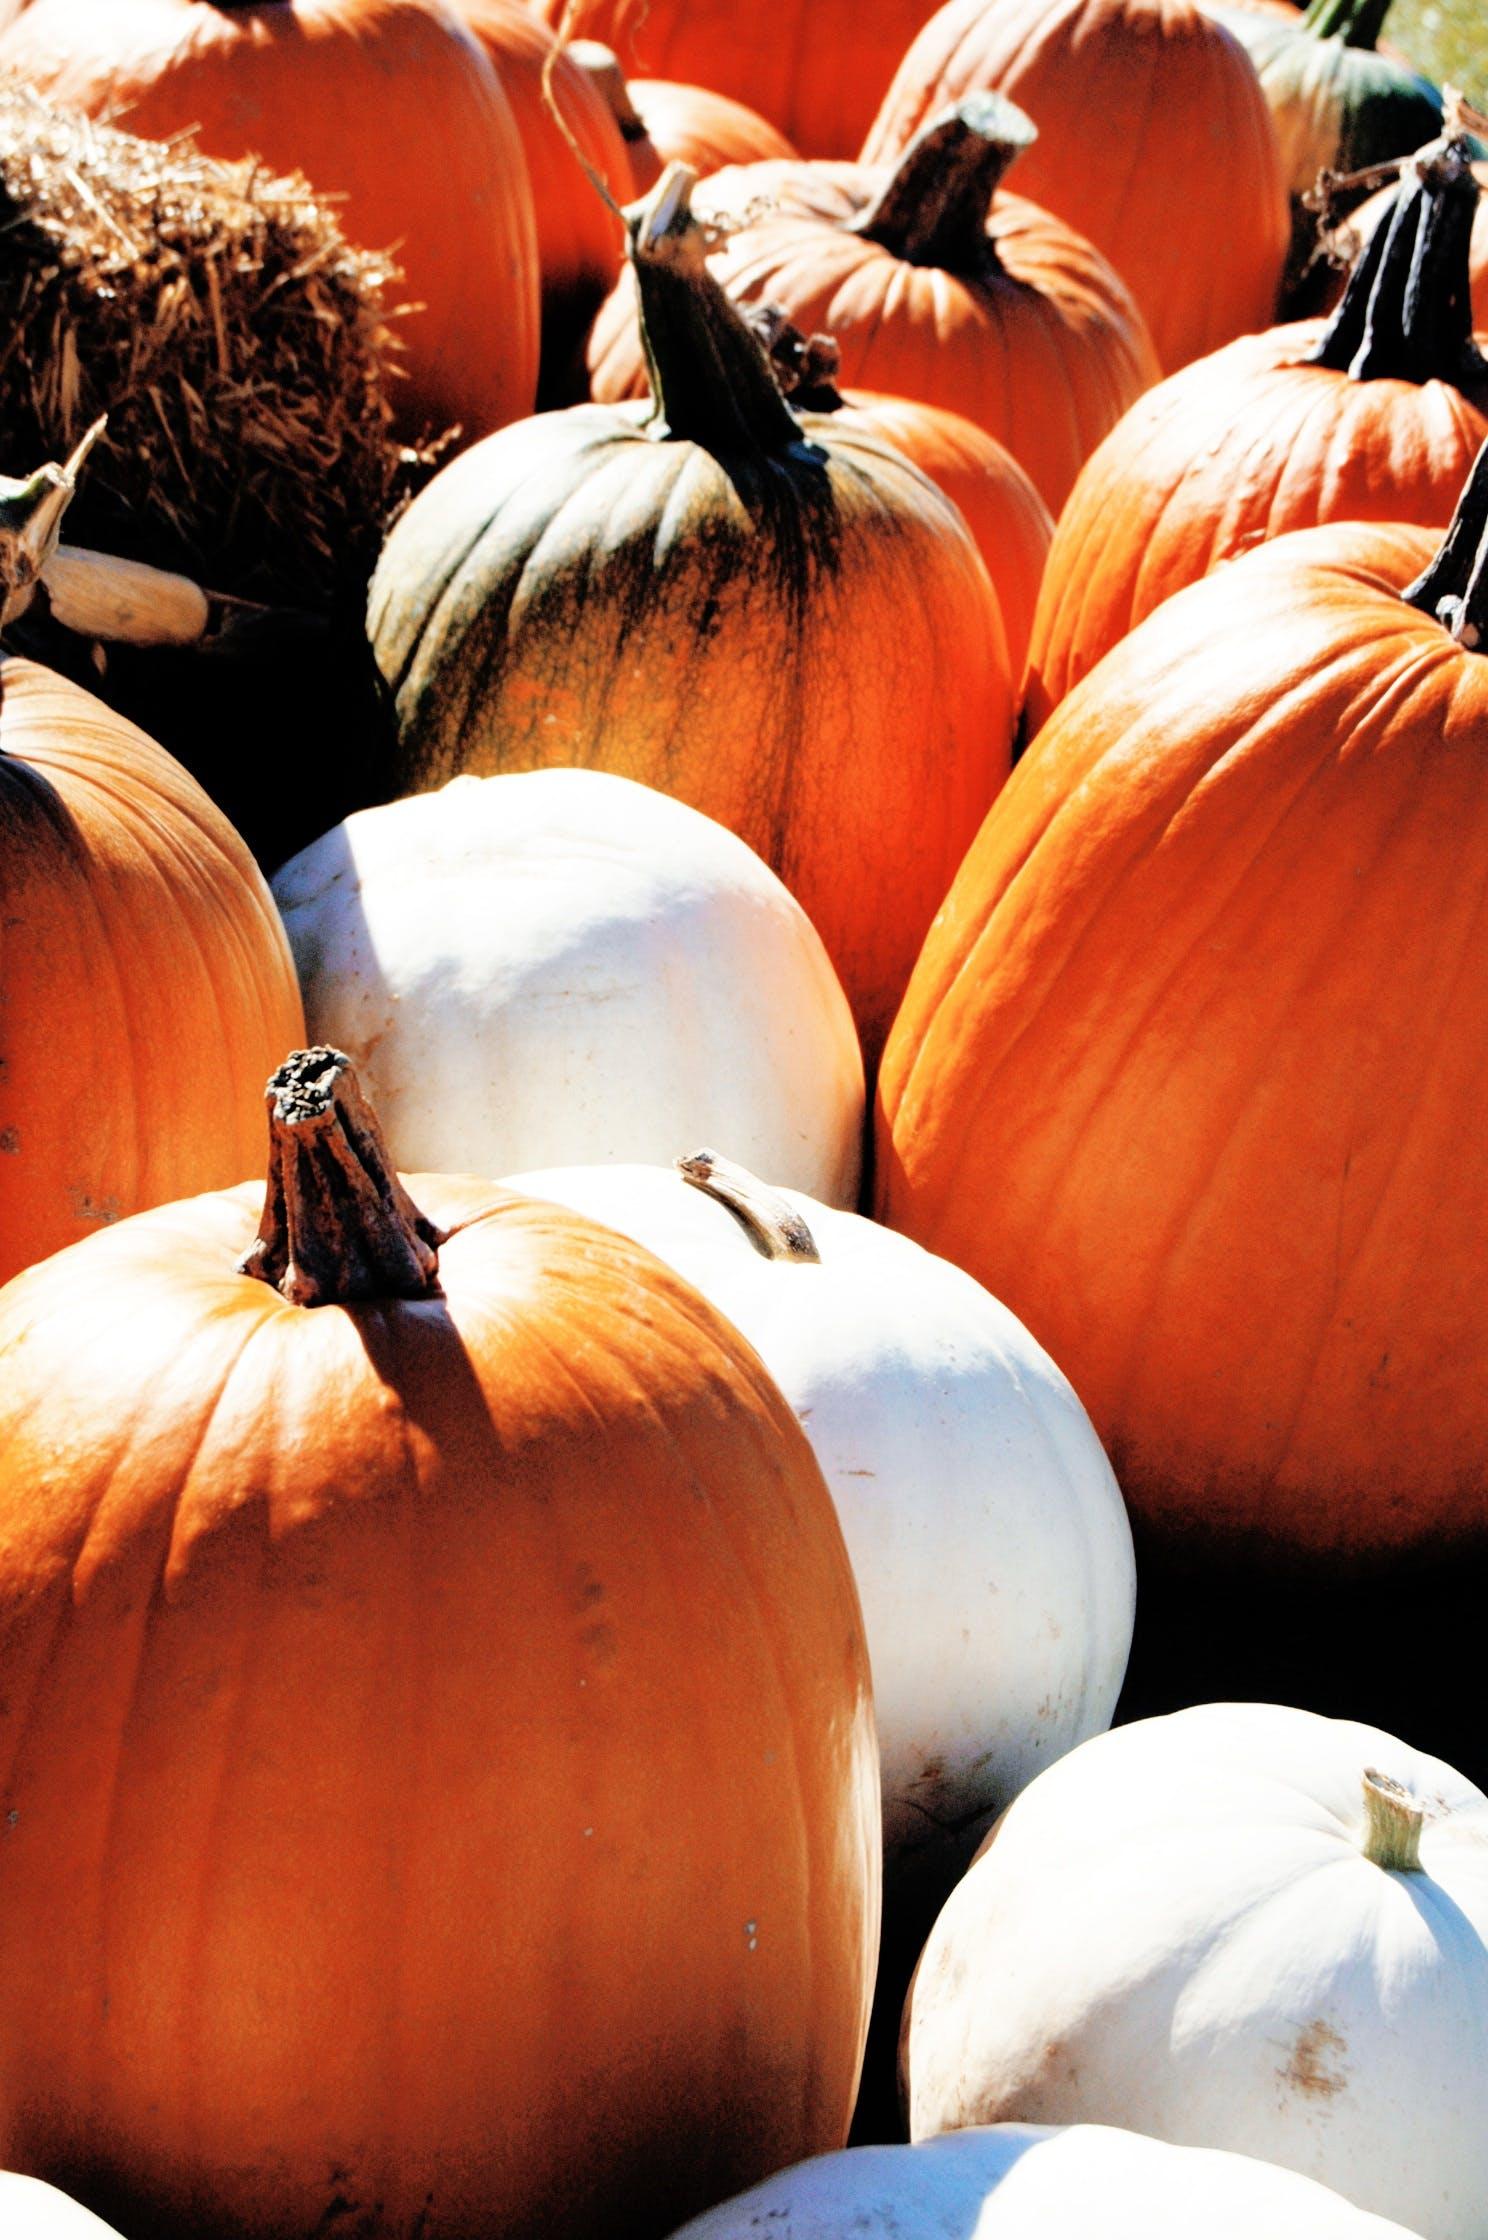 Free stock photo of food, harvest, fall, orange